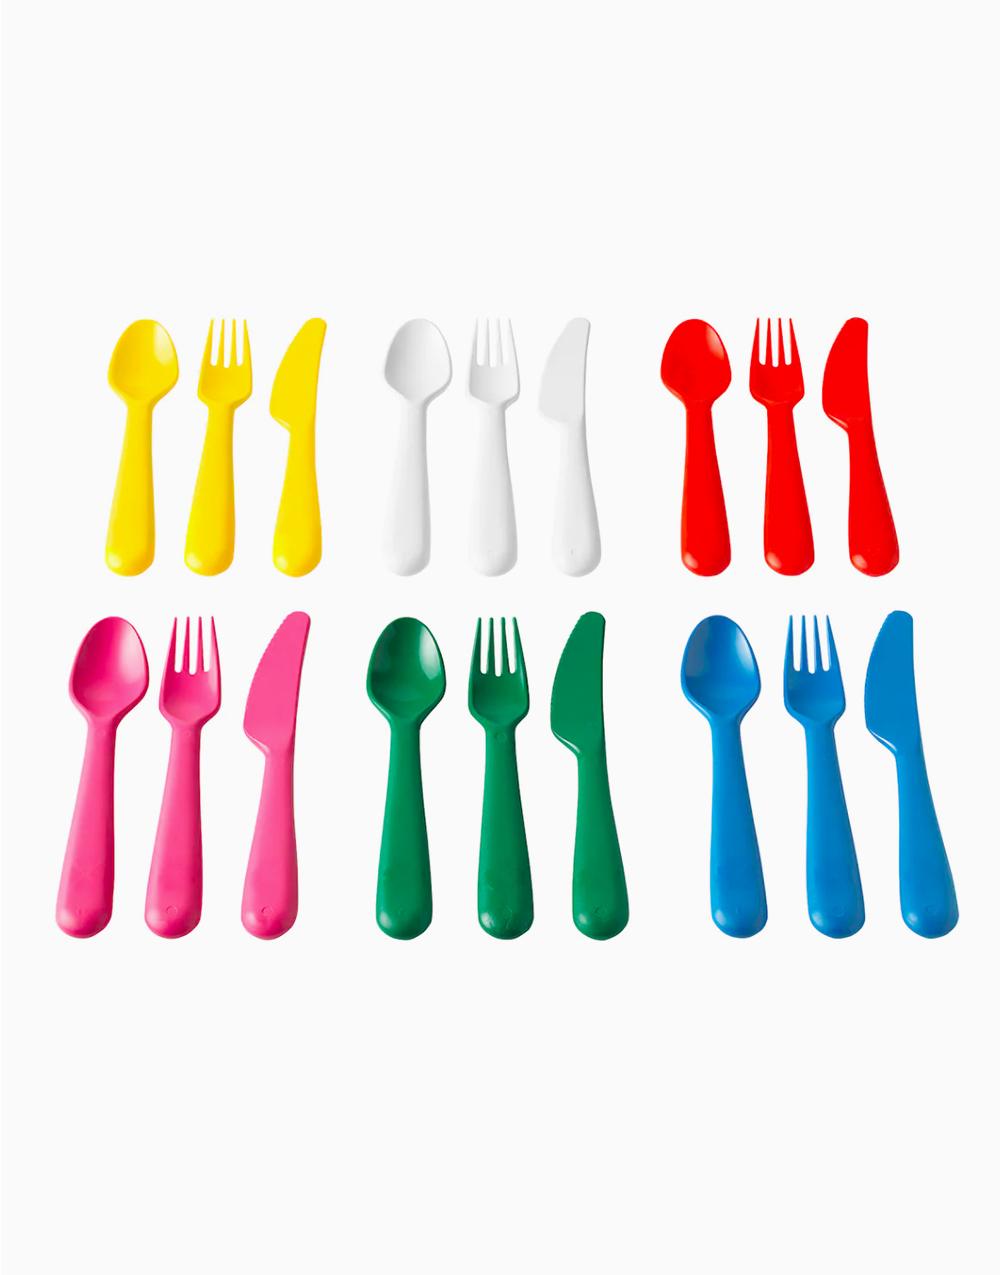 KALAS 18-piece Cutlery Set Multicolor by Ikea